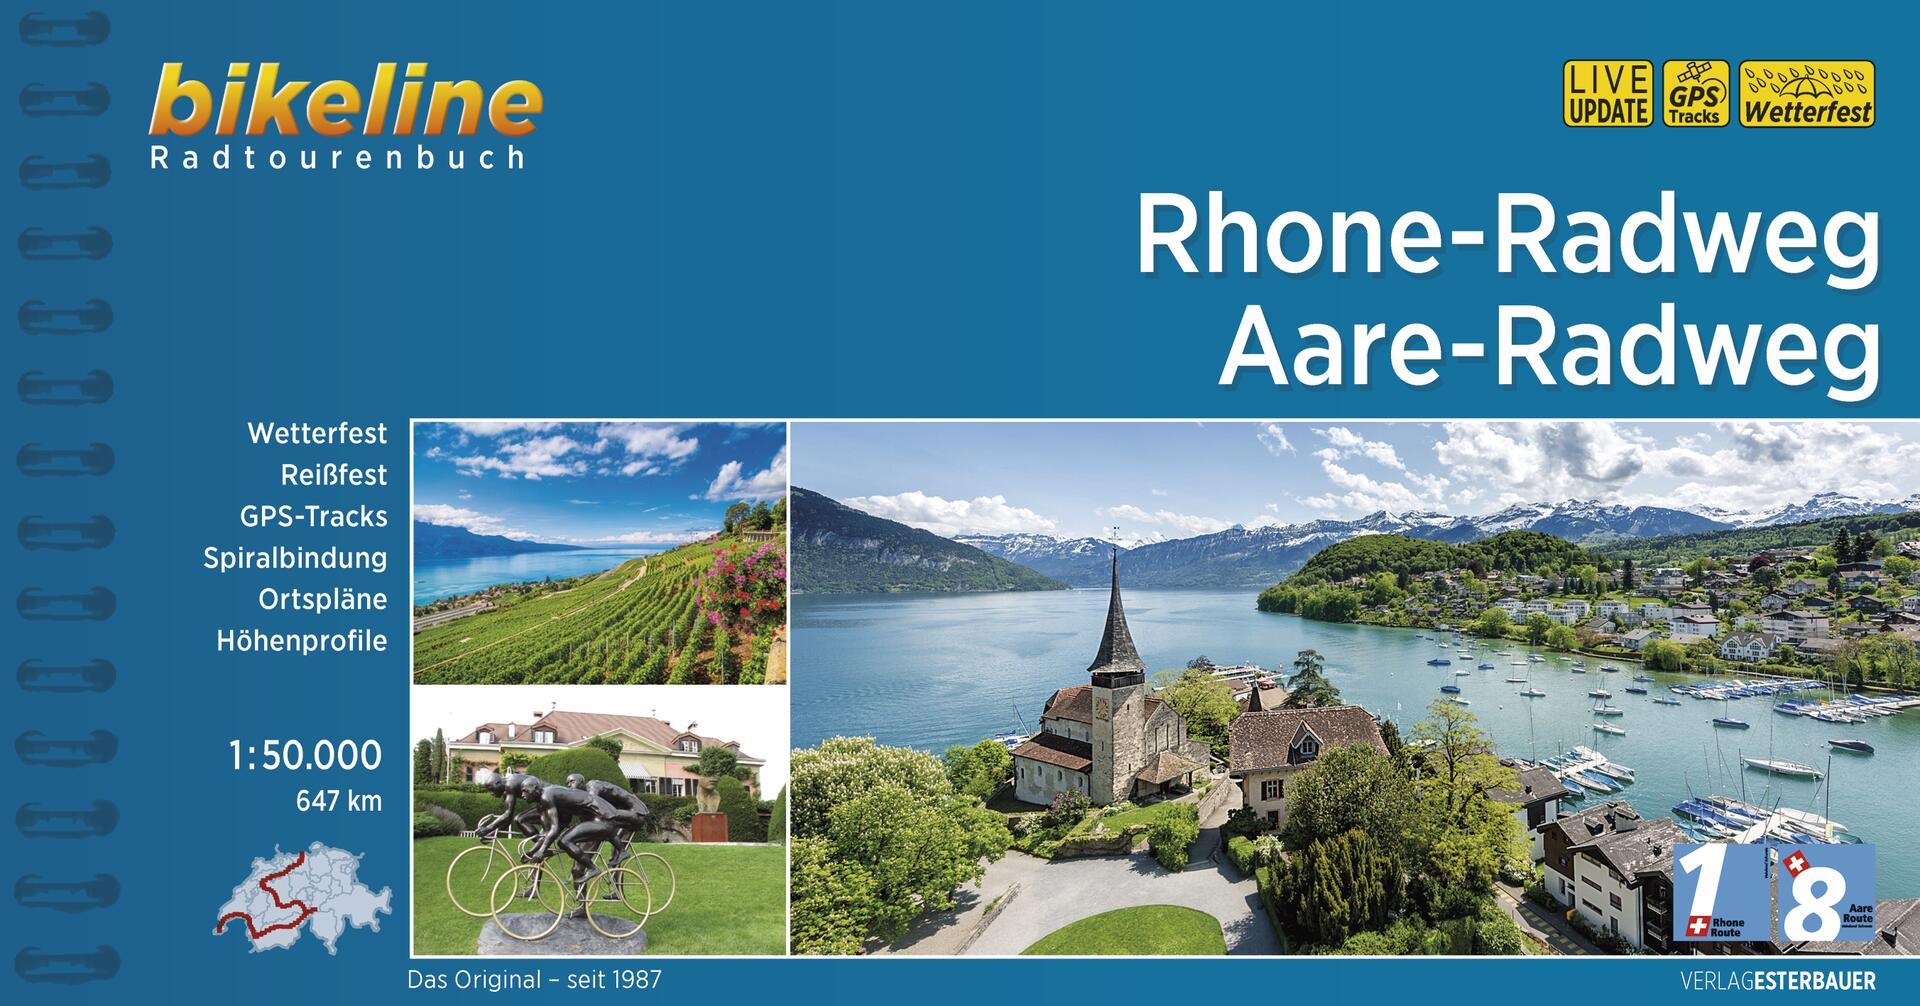 Foto vom Rhone-Radweg • Aare-Radweg